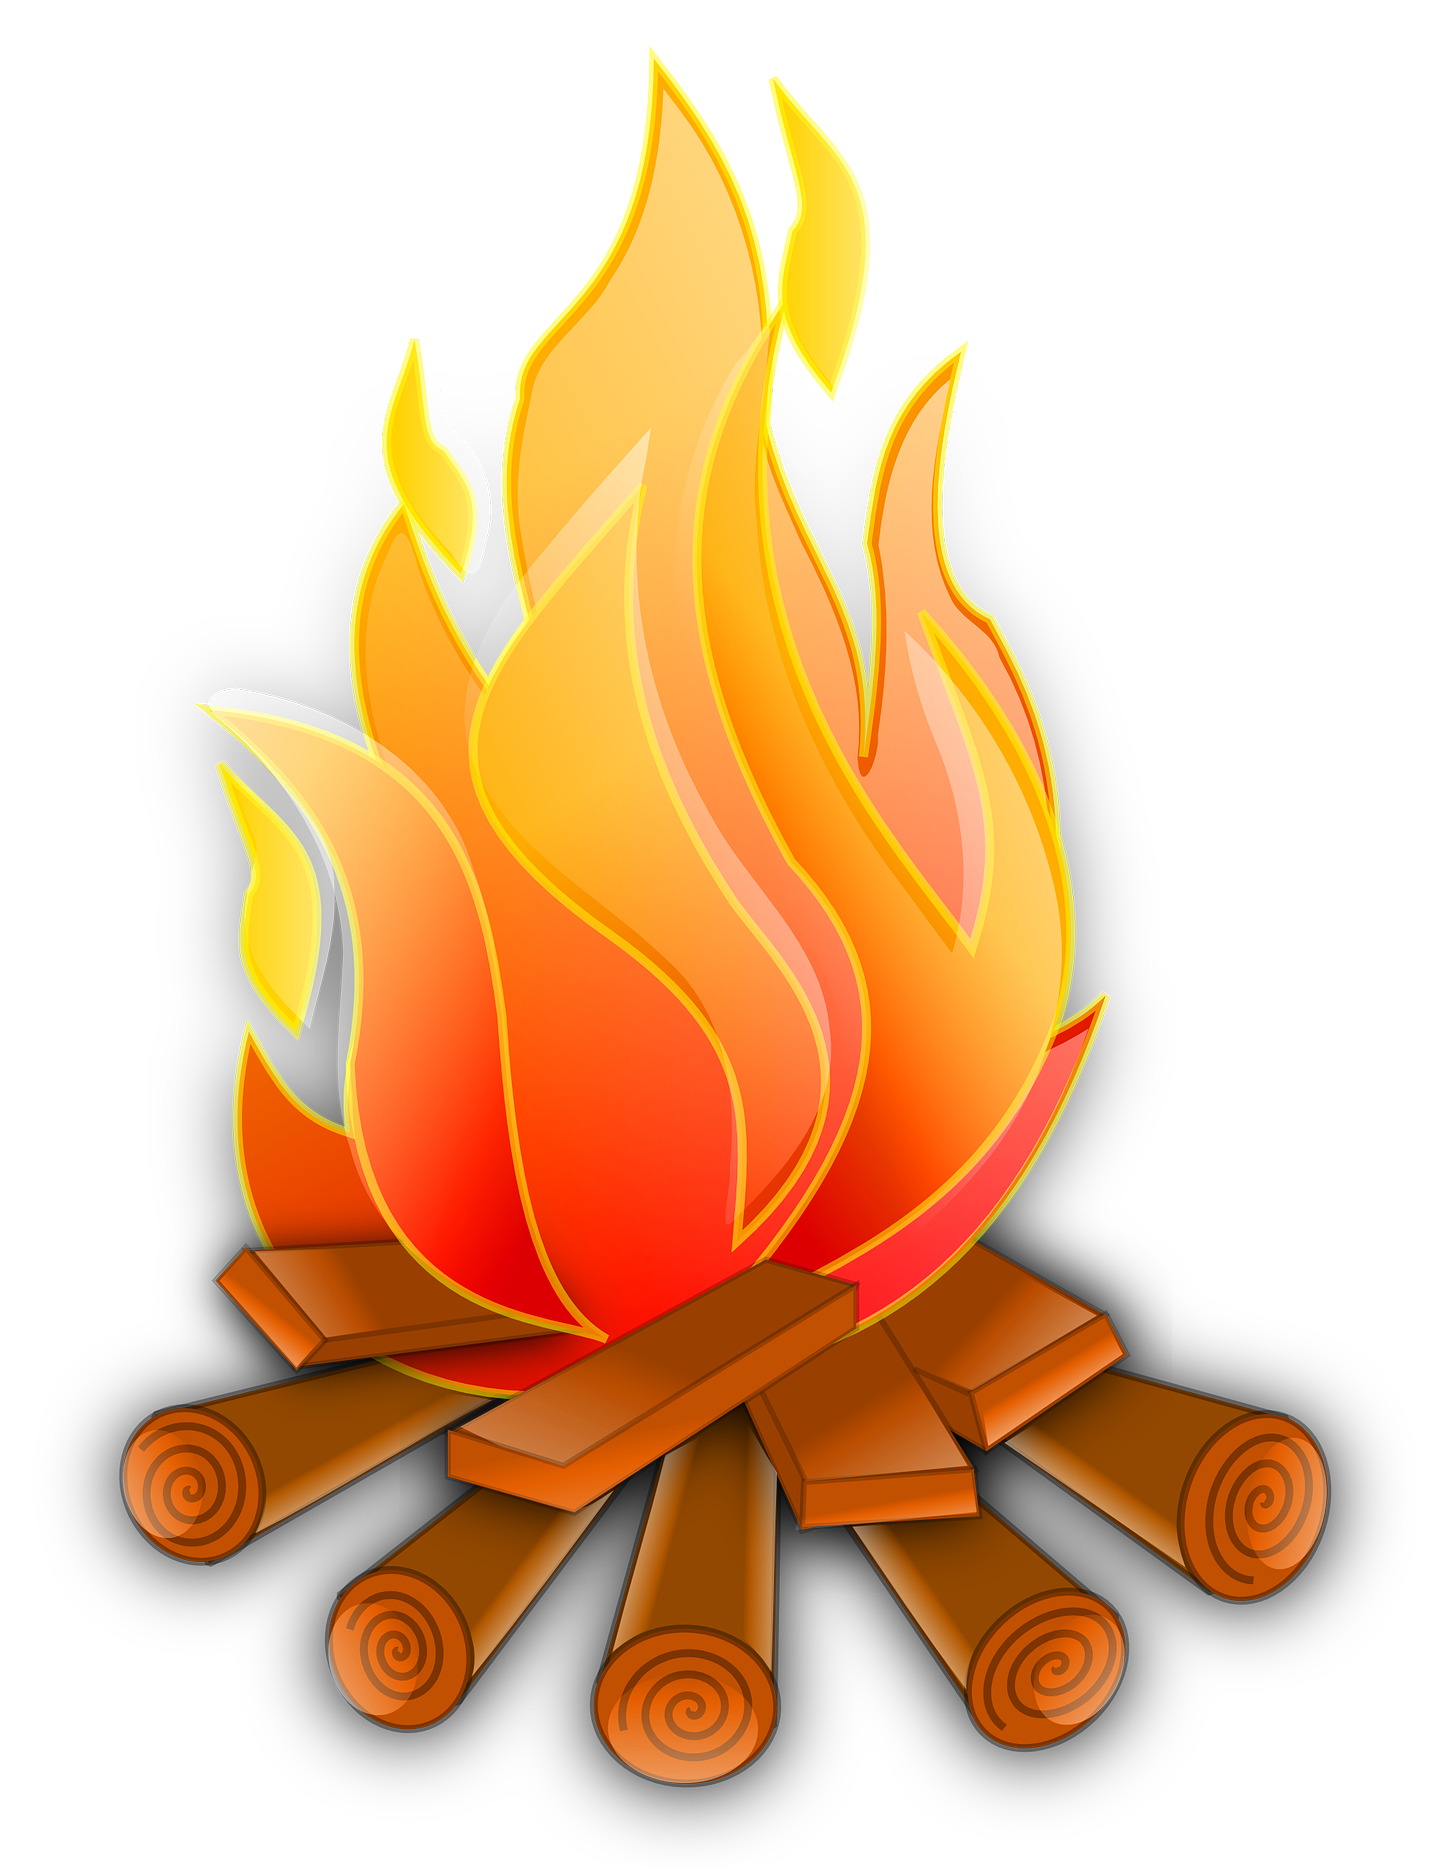 Jokingart com transparent. Hunting clipart campfire